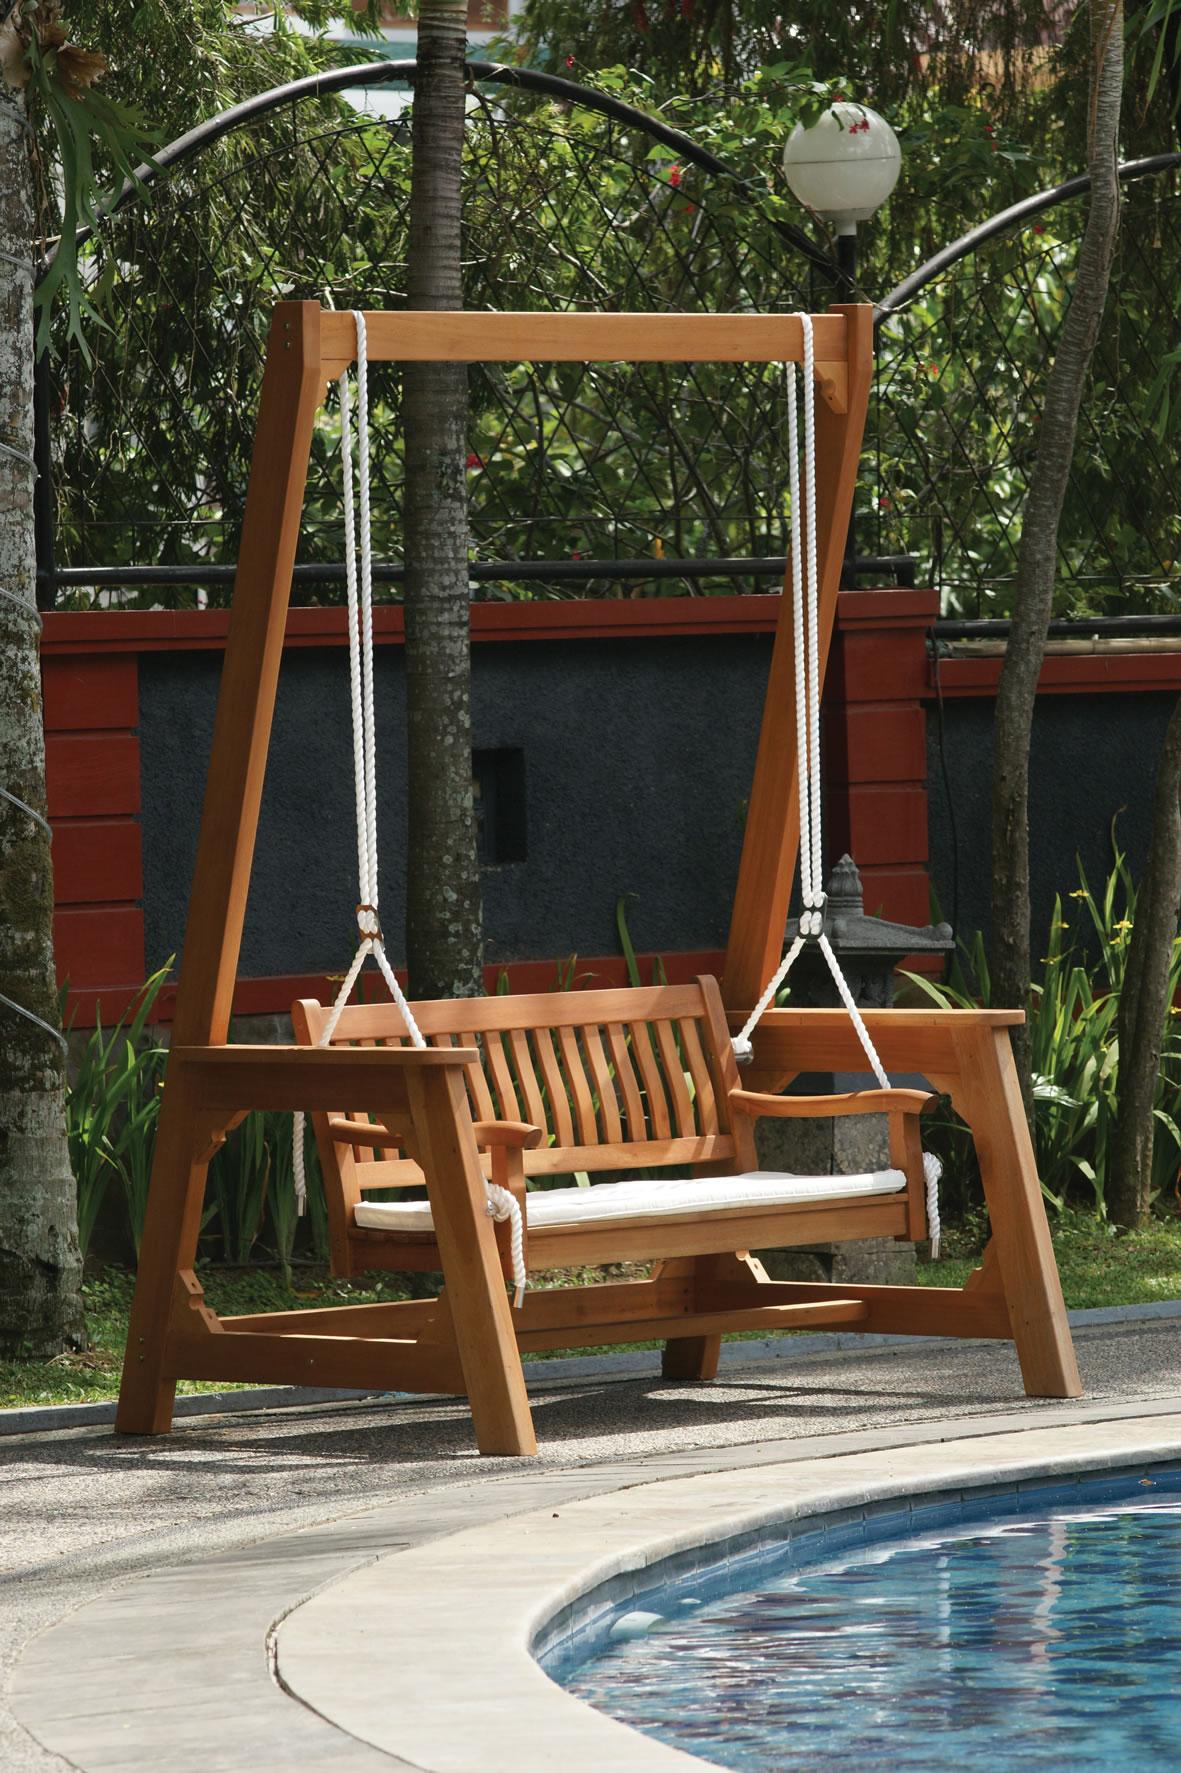 Marvelous Garden Swings: The Enchanting Element In Your Backyard